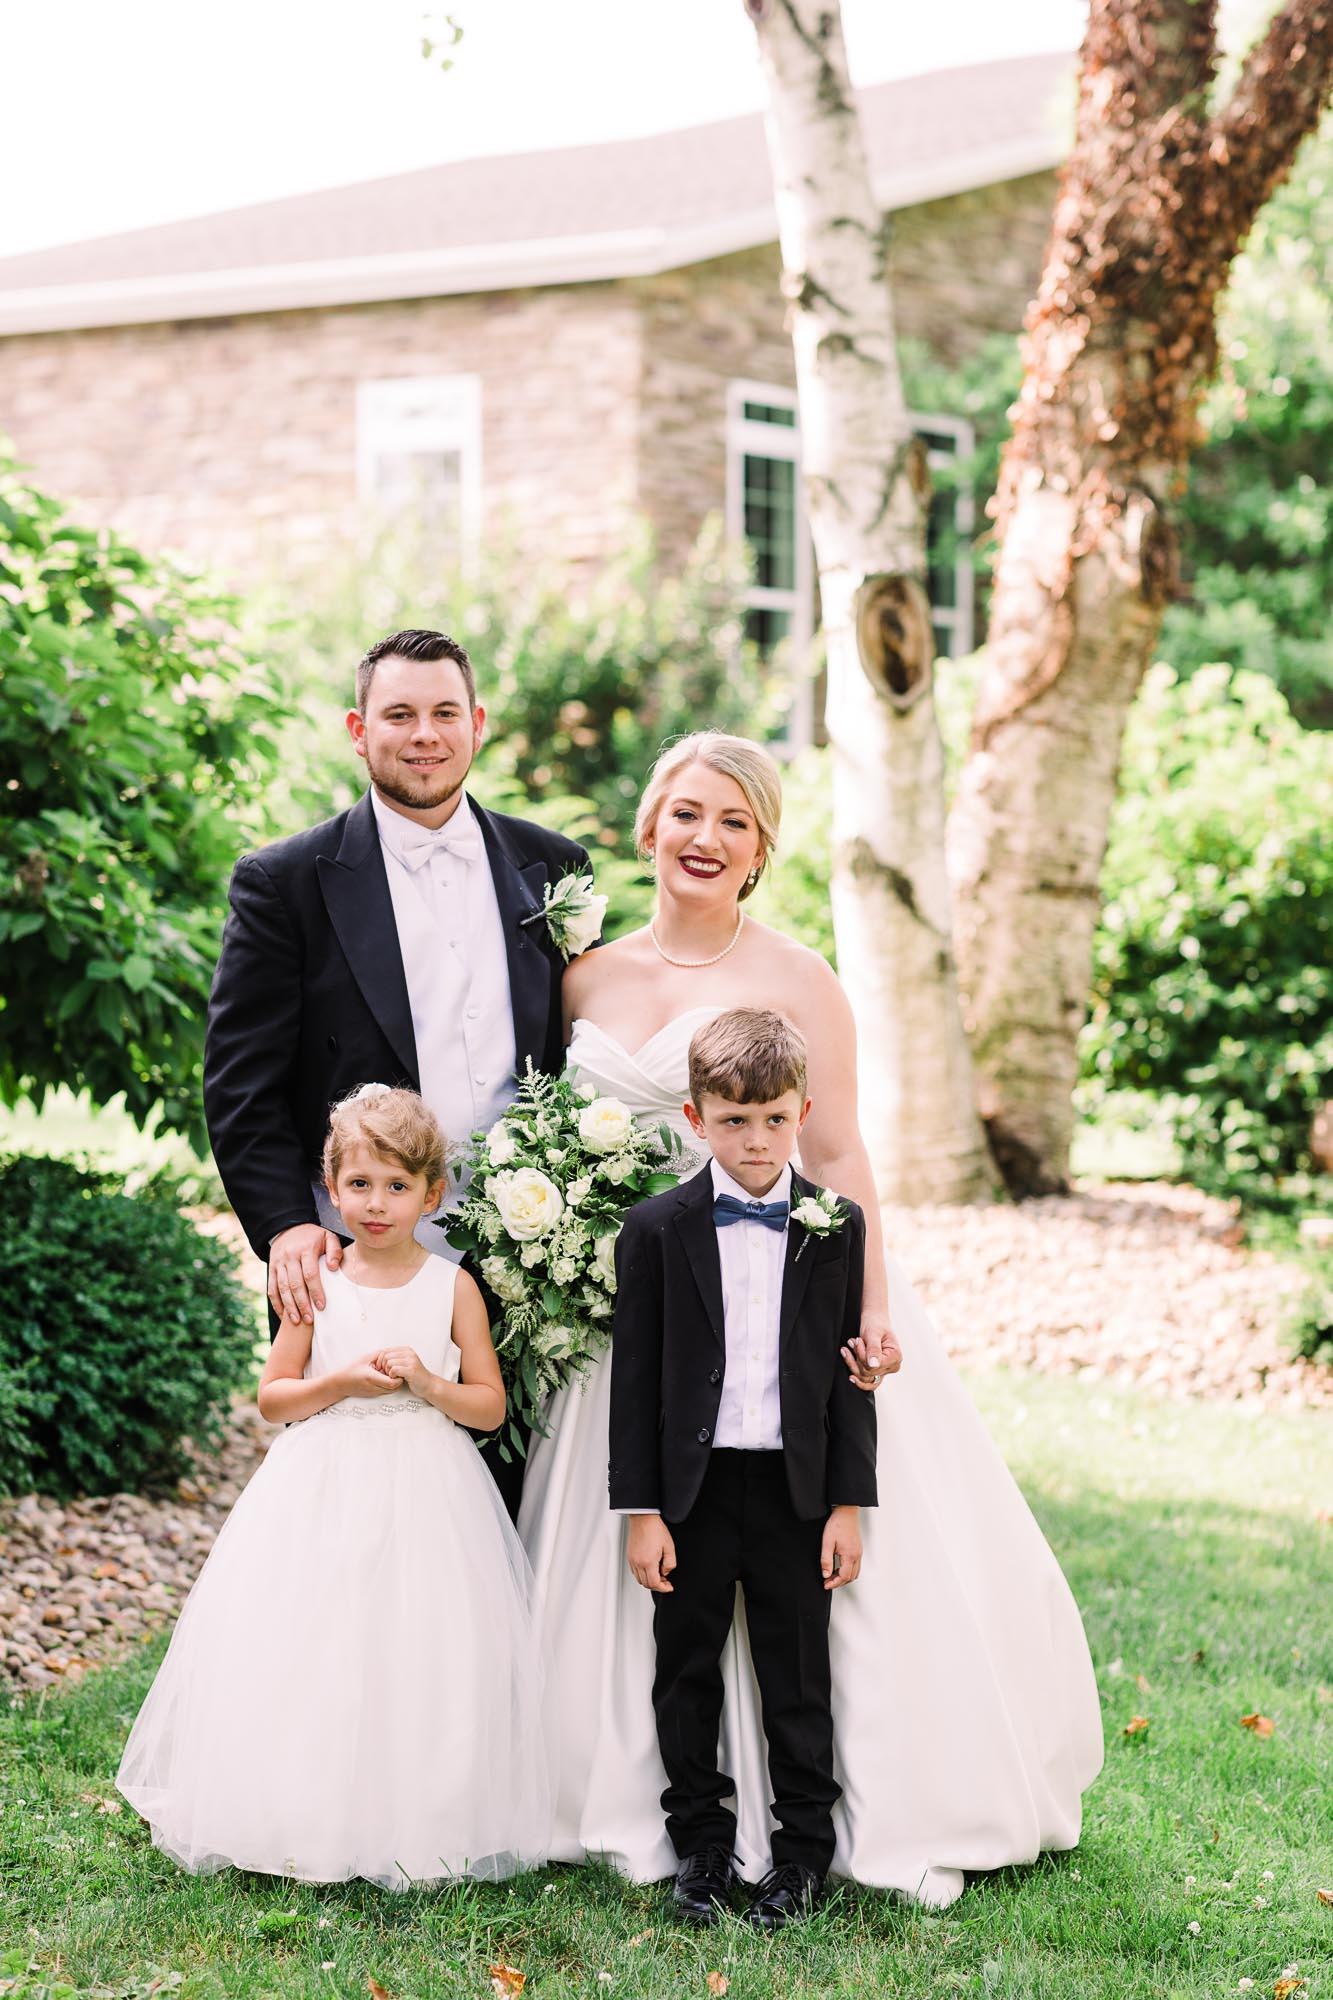 isle-of-que-wedding-3970.jpg